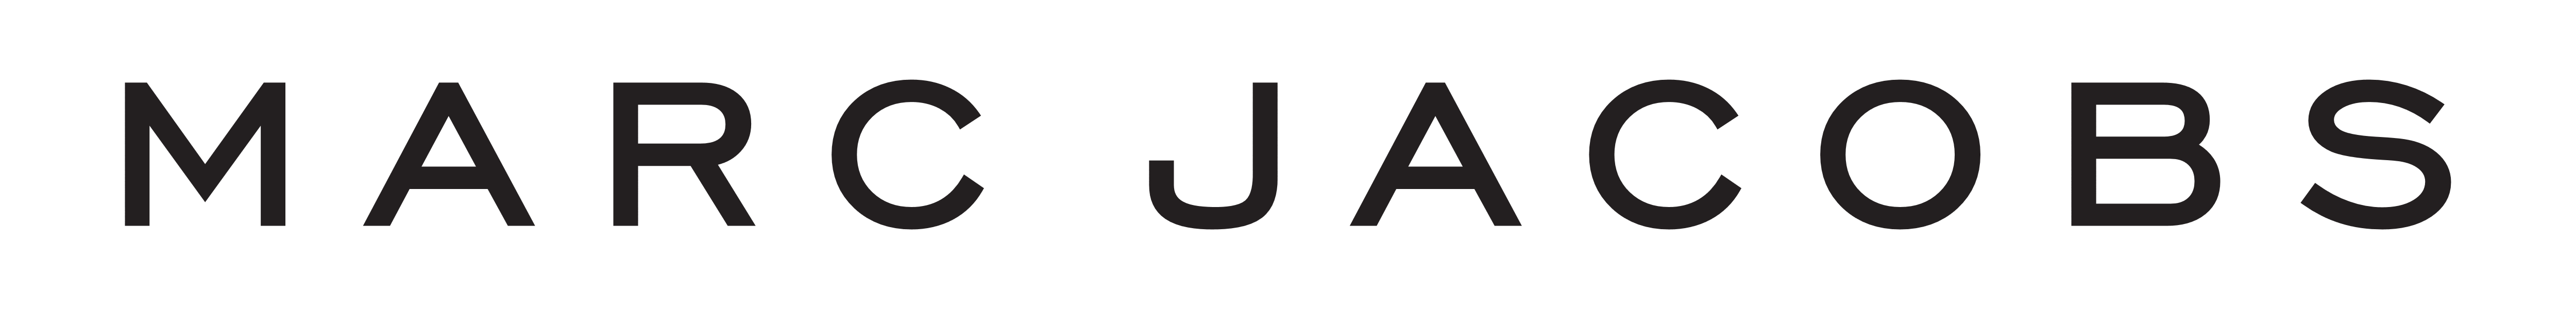 Marc_Jacobs_logo